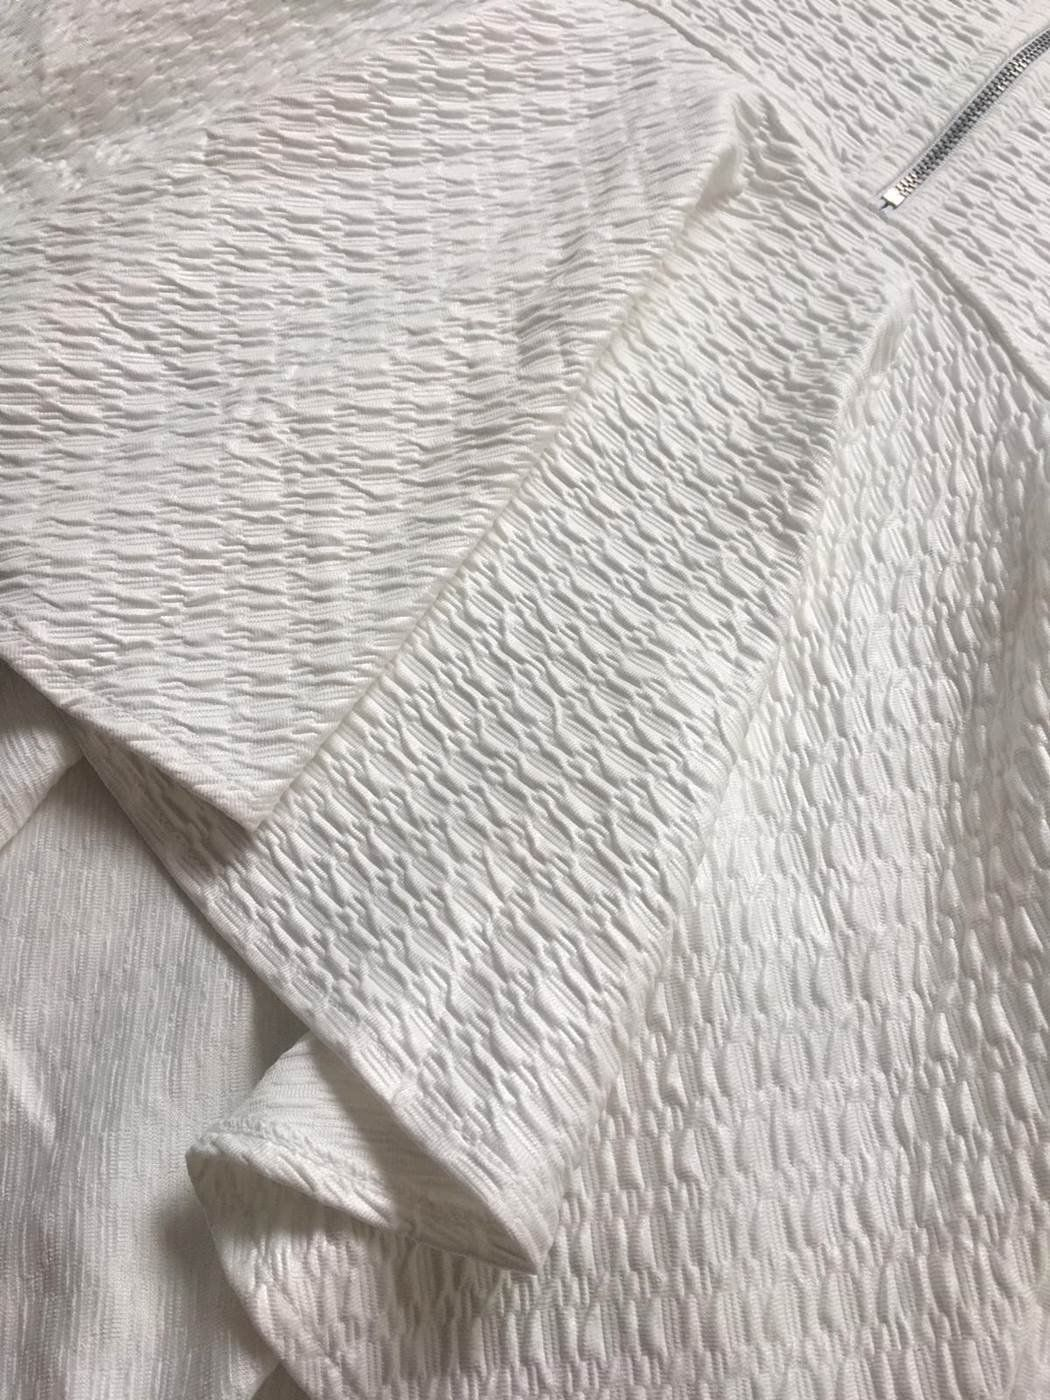 Saia Sereia de Ziper Frontal Saia Bella cod SB7707.branco